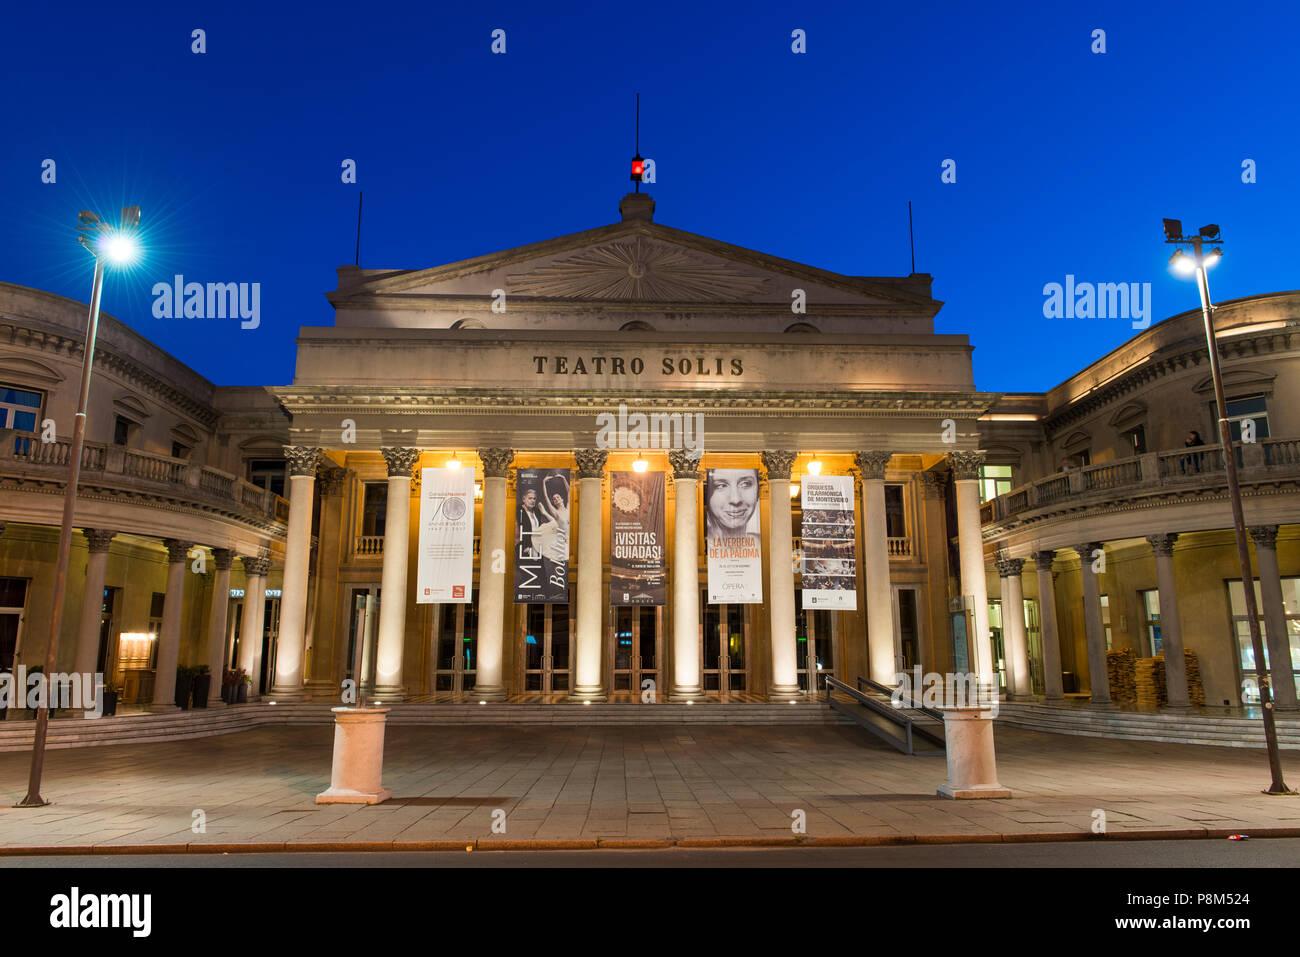 Teatro Solis, Theatre, Dusk, Montevideo, Uruguay - Stock Image